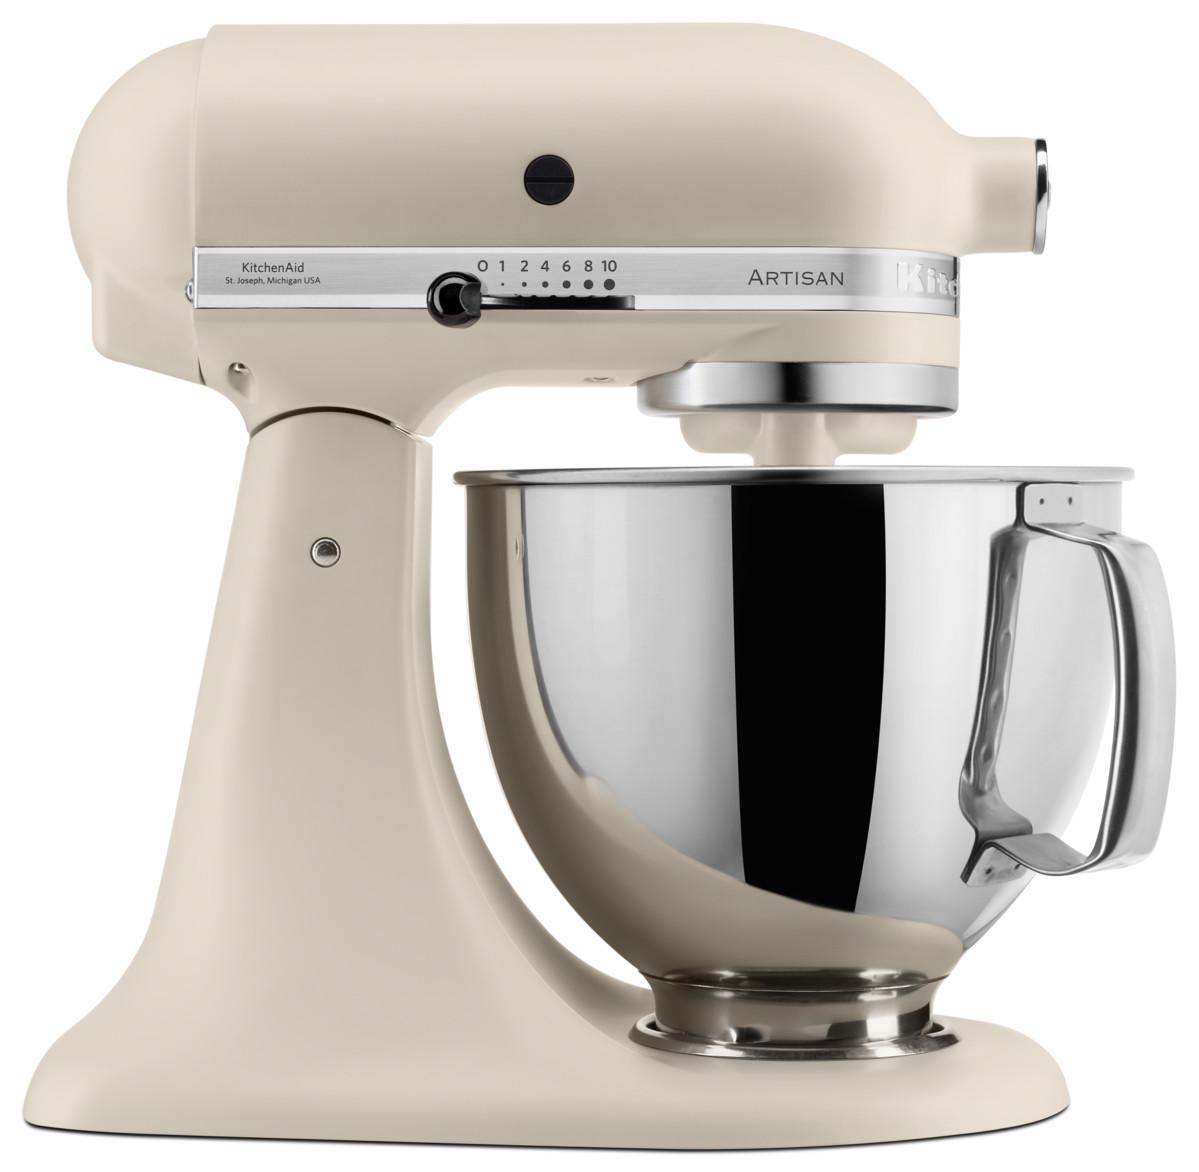 KITCHEN A 4.8L食物廚師機 5KSM175PSBFL 米白色